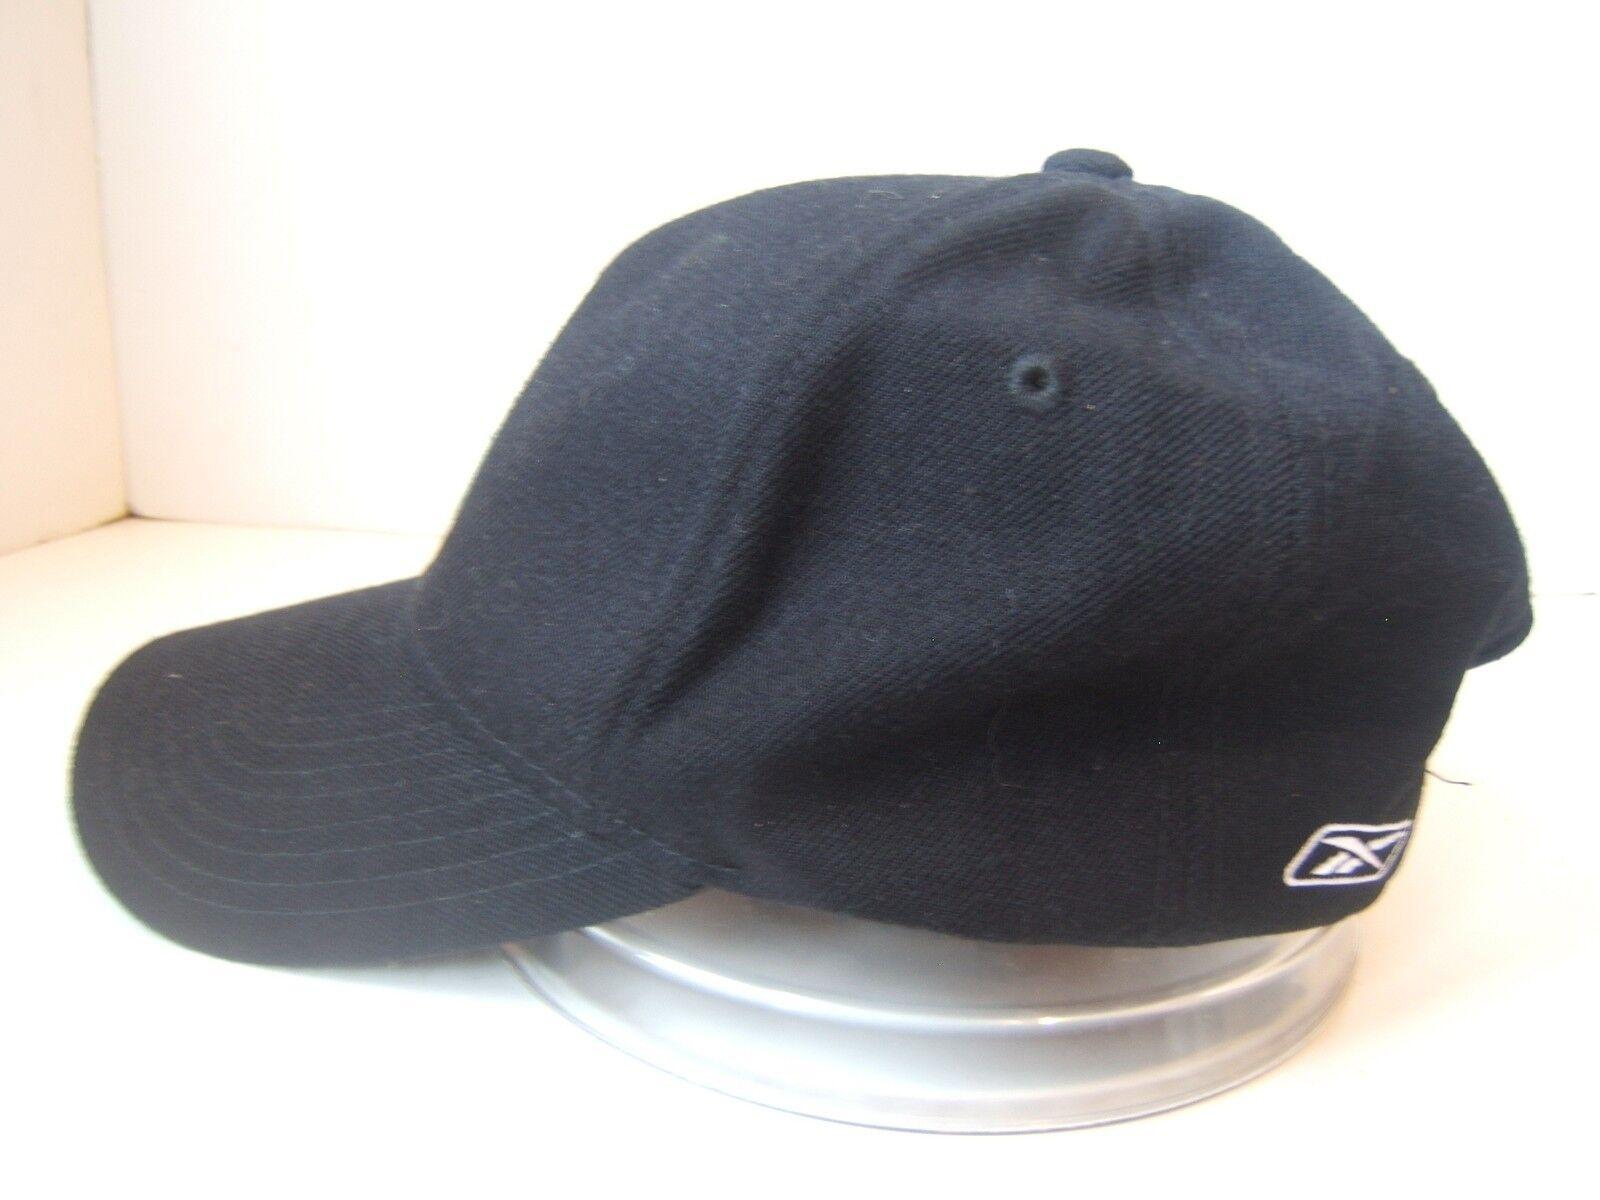 Pittsburgh Steelers NFL Football Hat Black Cap Reebok Hook Loop Baseball Cap  Black . d3abb100a1